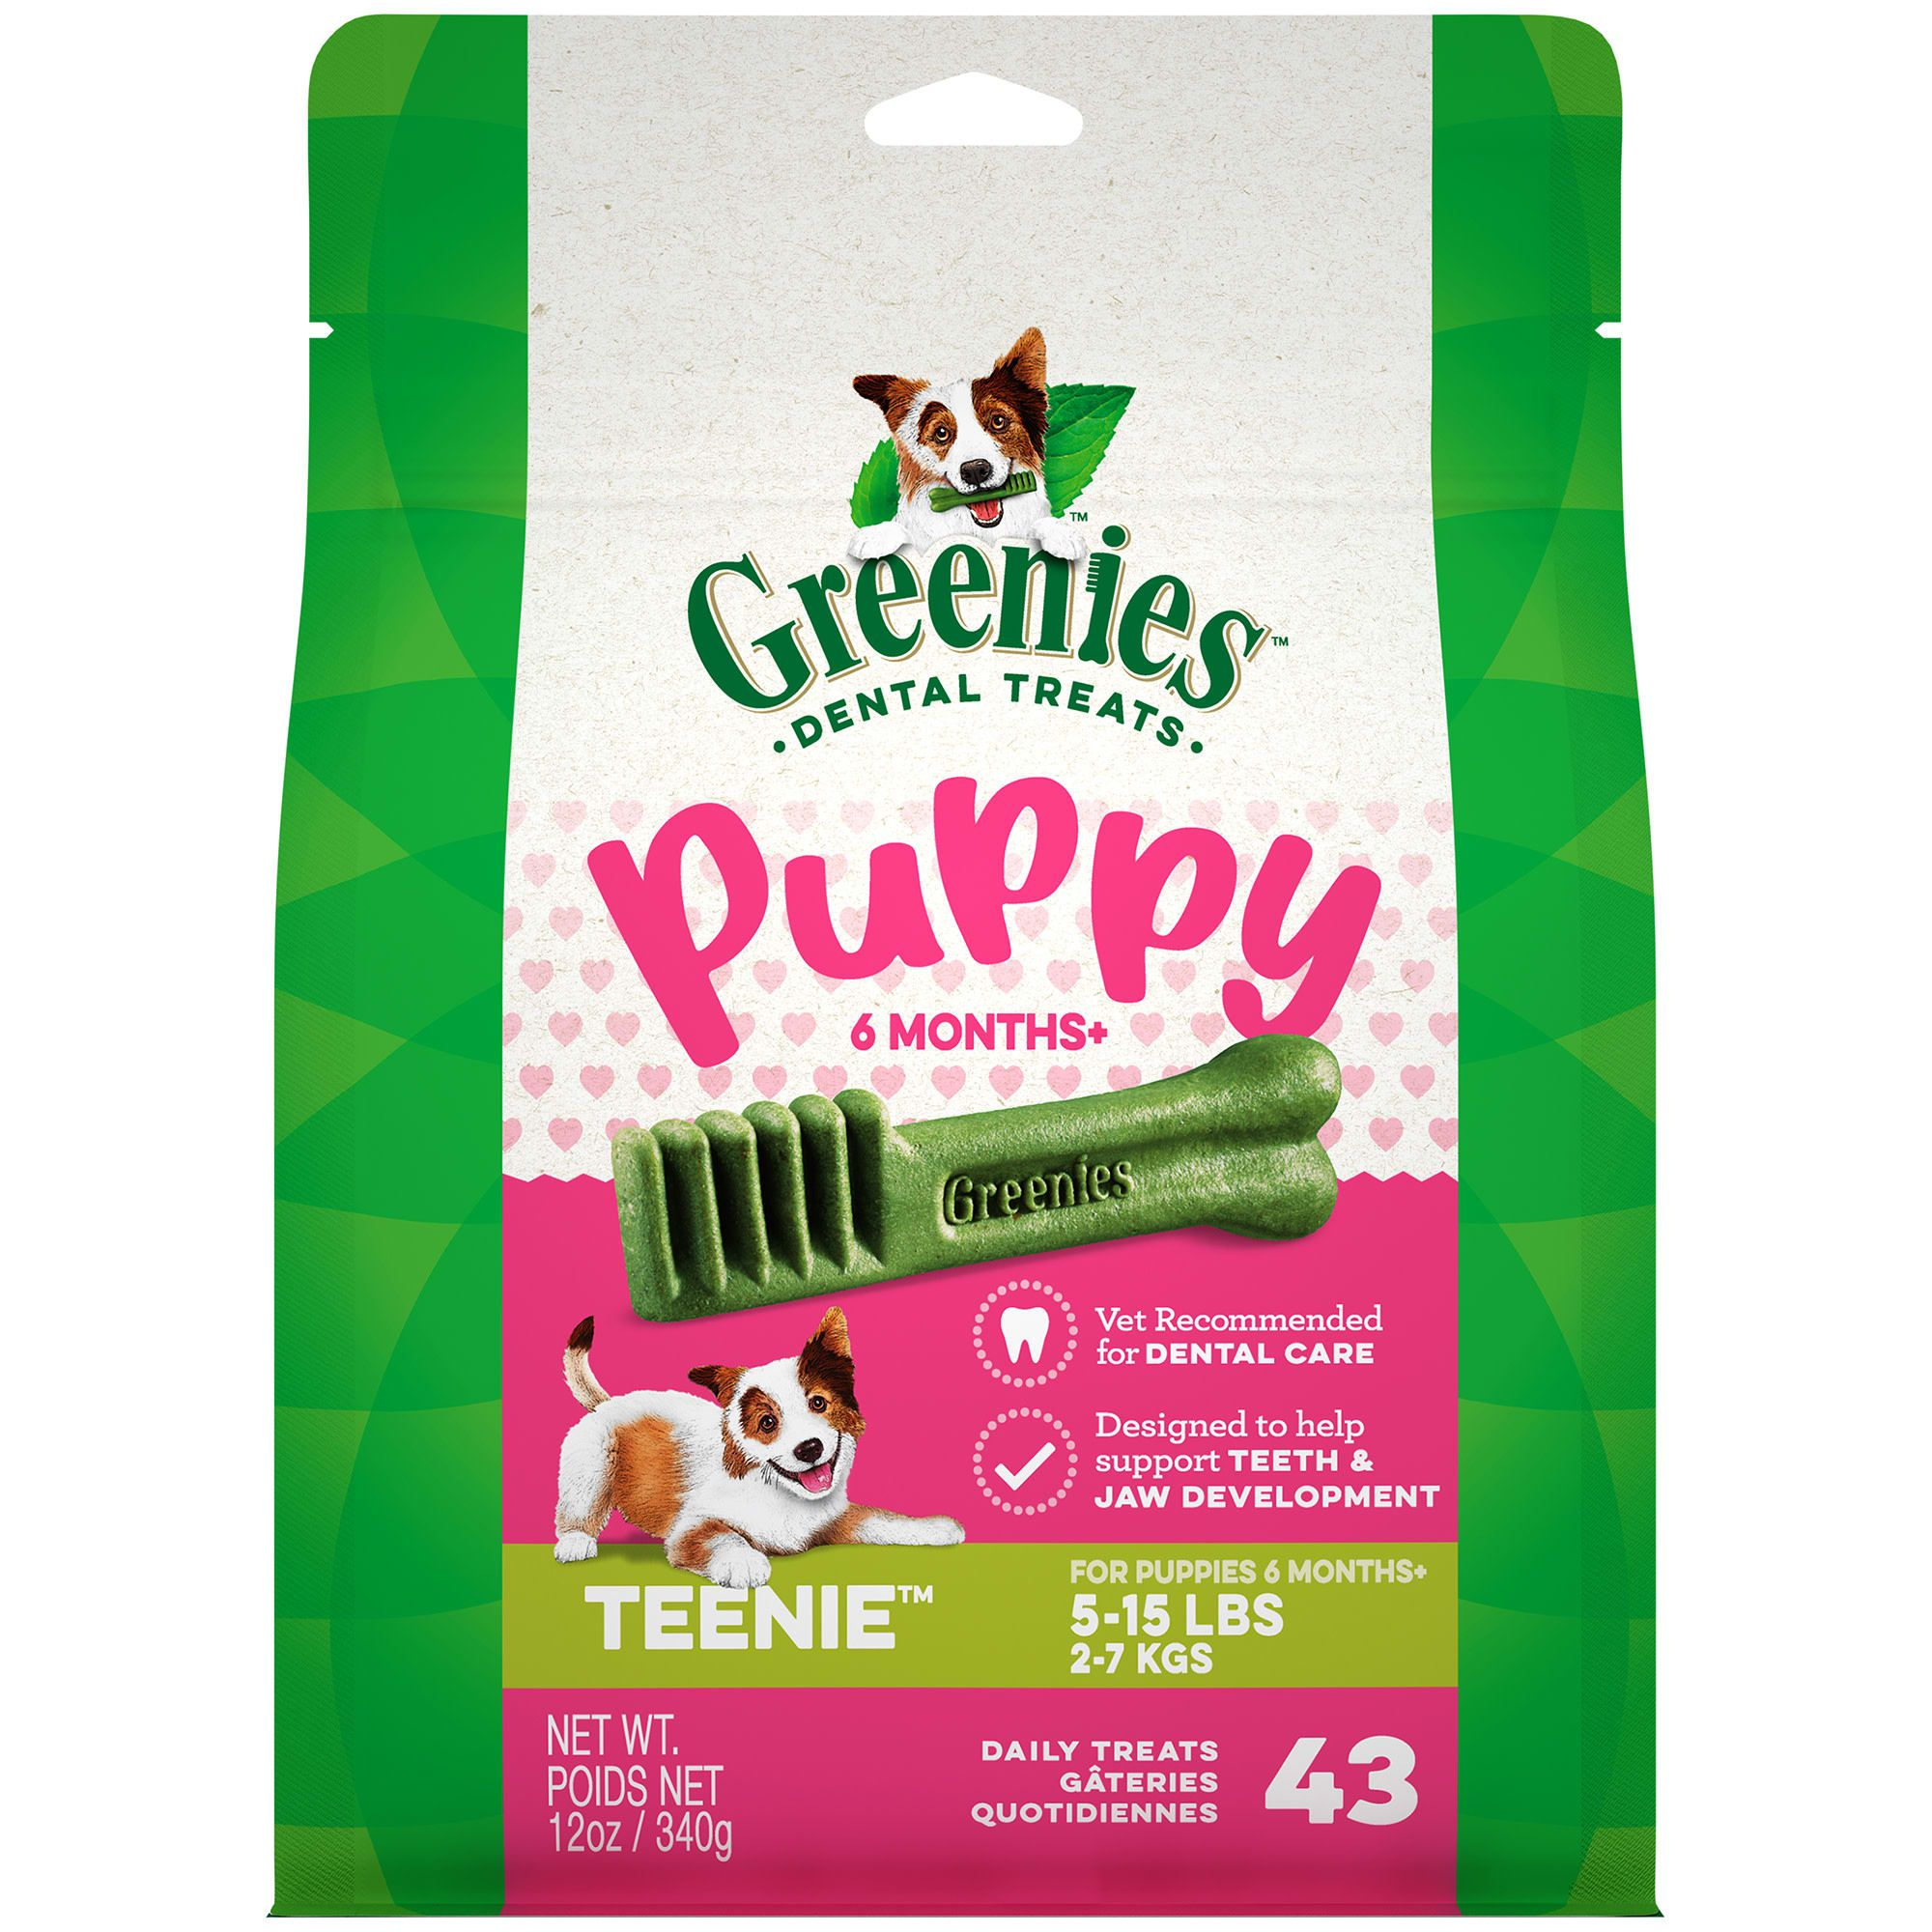 Greenies Puppy 6 Months Teenie Size Dental Treats 12 Oz Count Of 43 In 2020 Dog Dental Care Greenies Dog Treats Dental